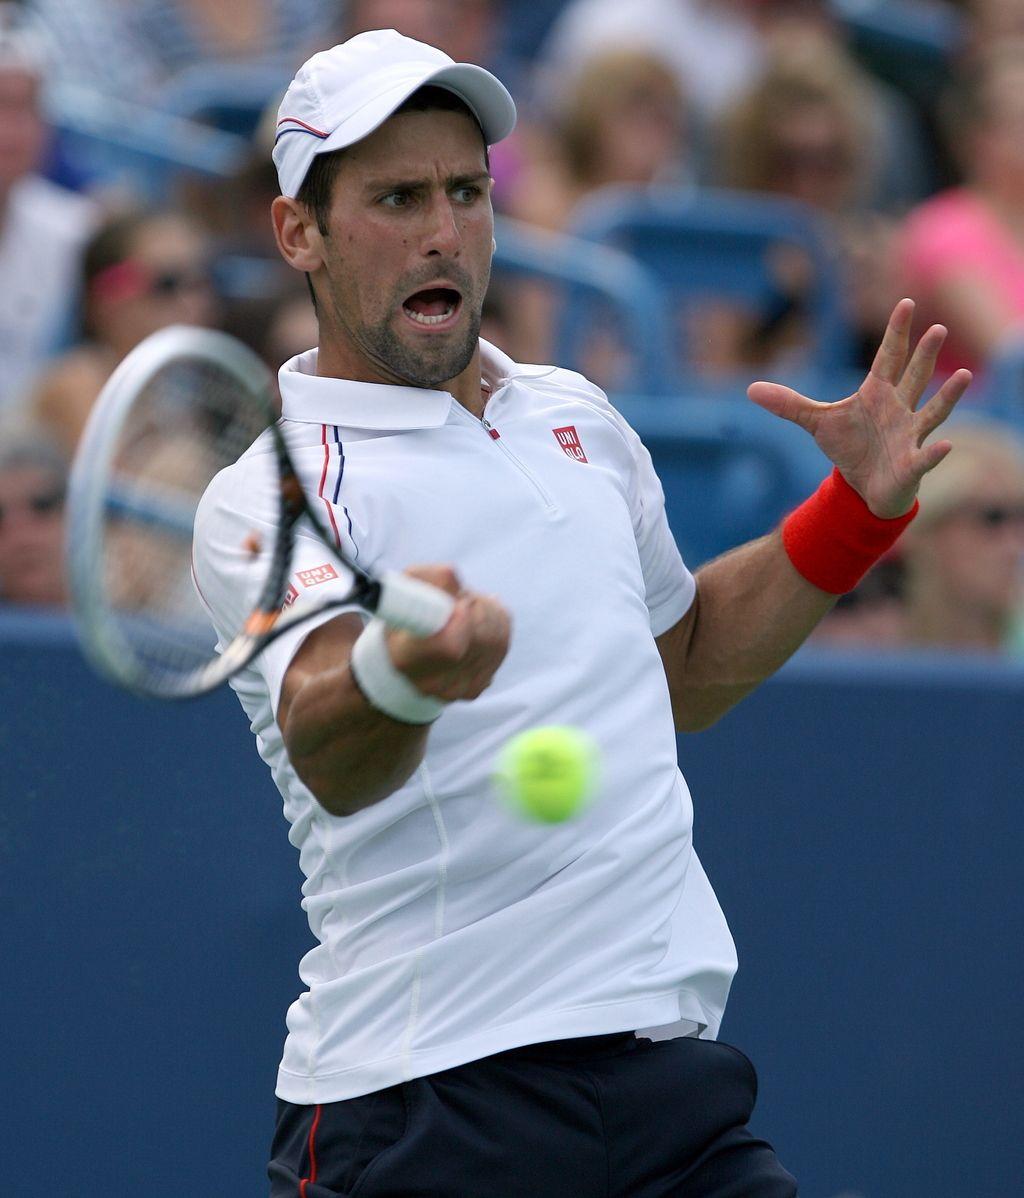 Torneo de tenis de Cincinnati, Masters 1000